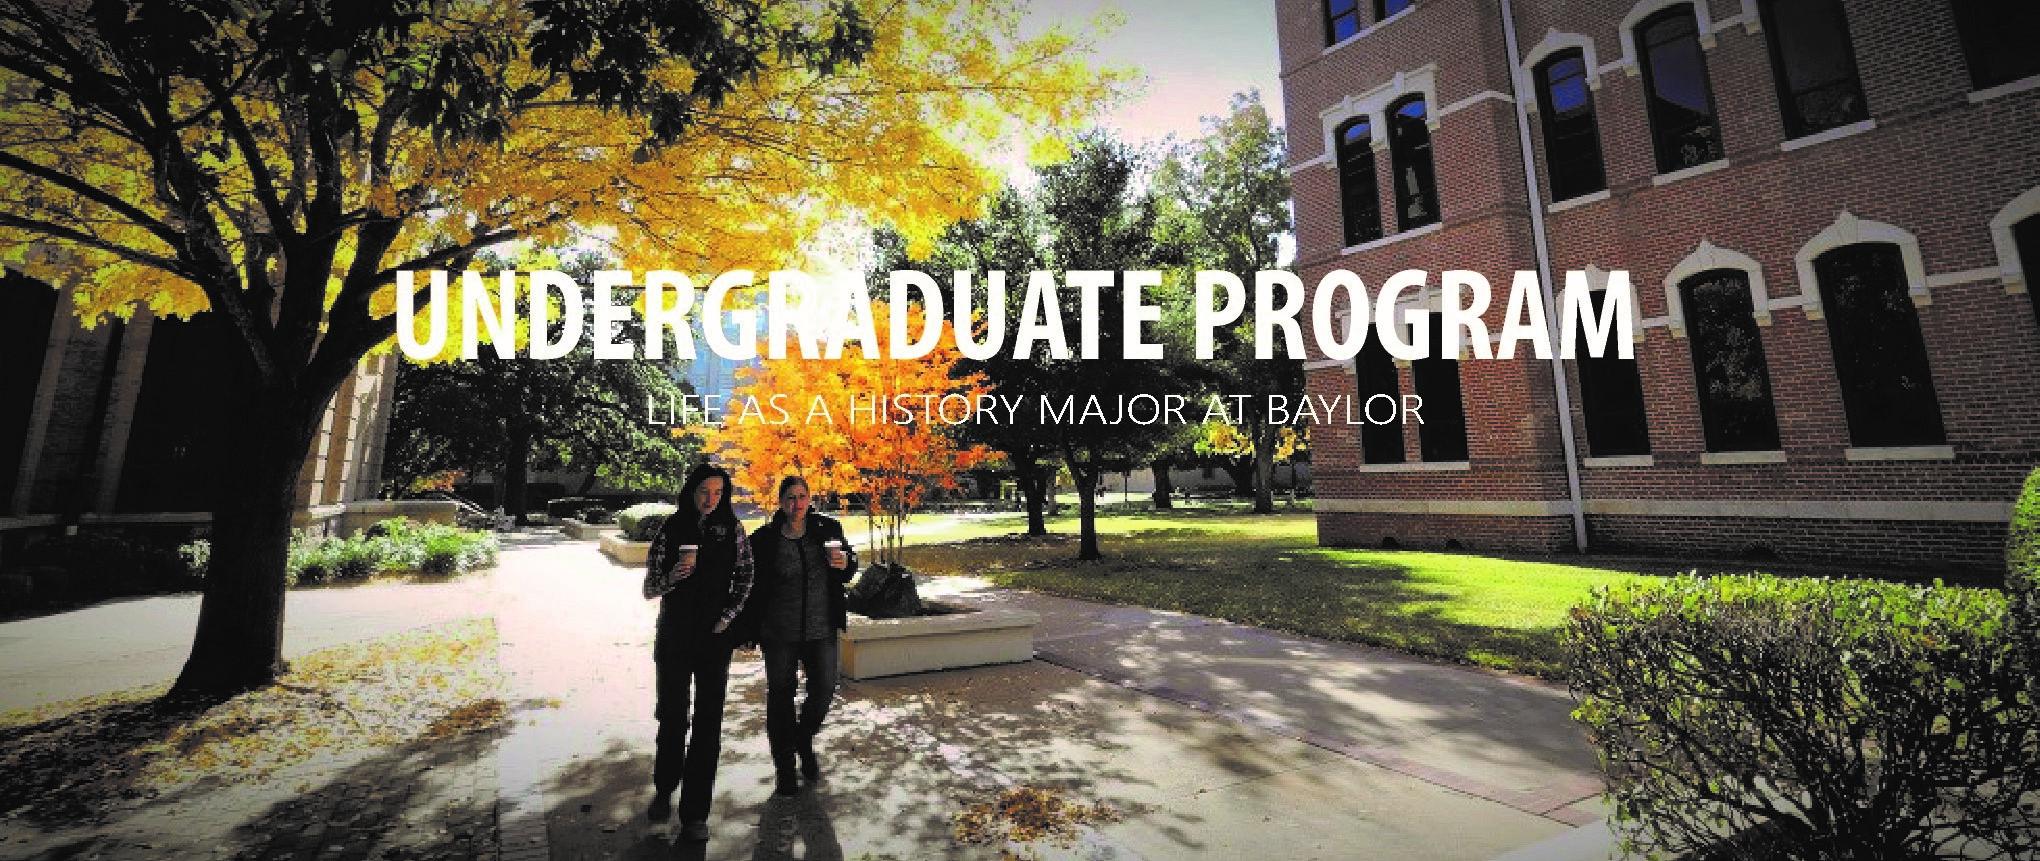 Undergrad Program Banner 2018